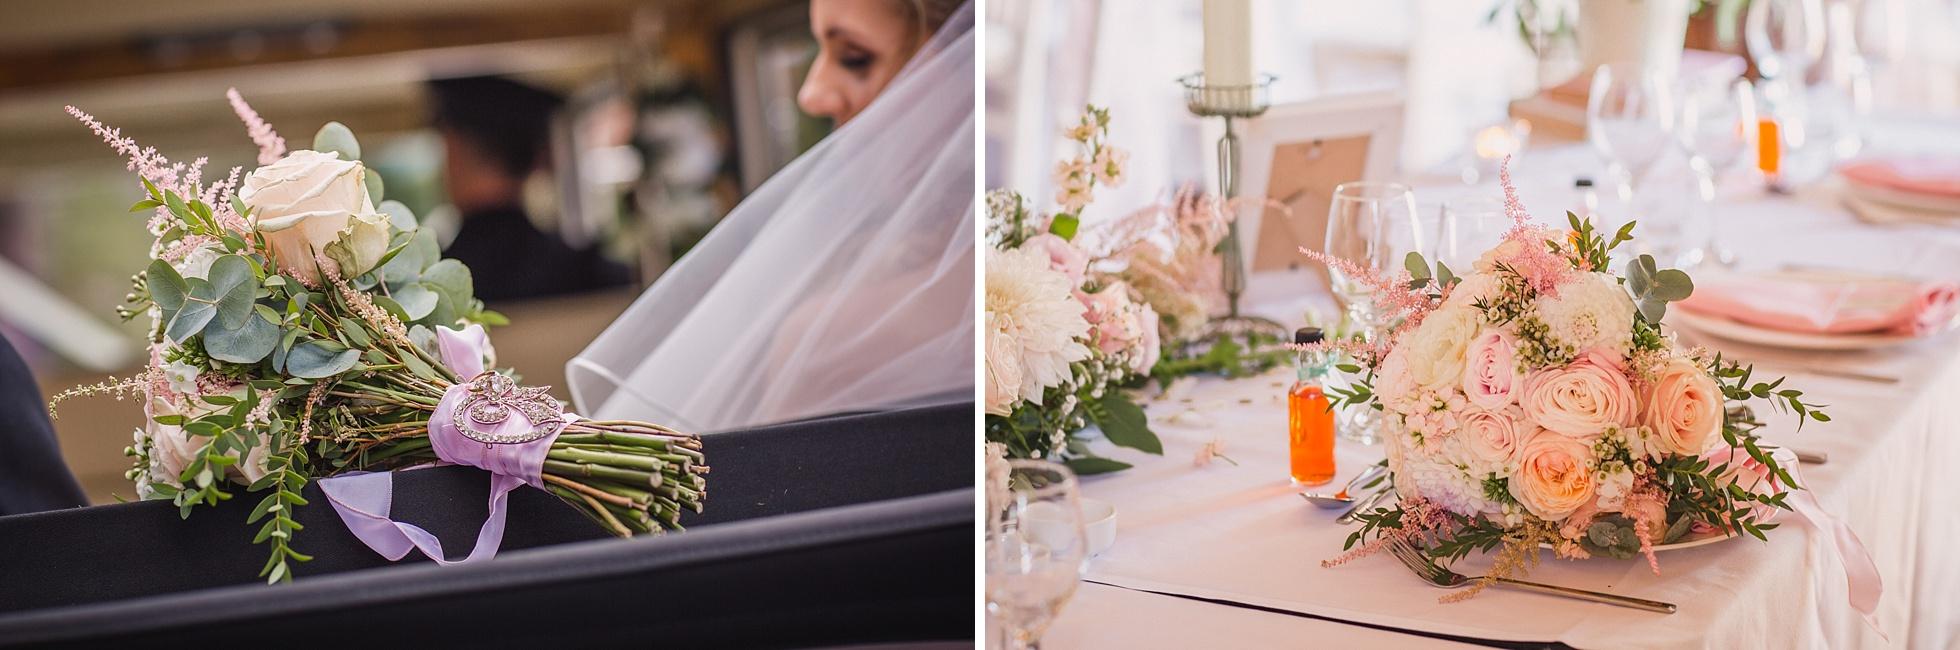 Holly's and Glenn's wedding ceremony at All Hallows Church Tillington and wedding reception at Grittenham Barn.